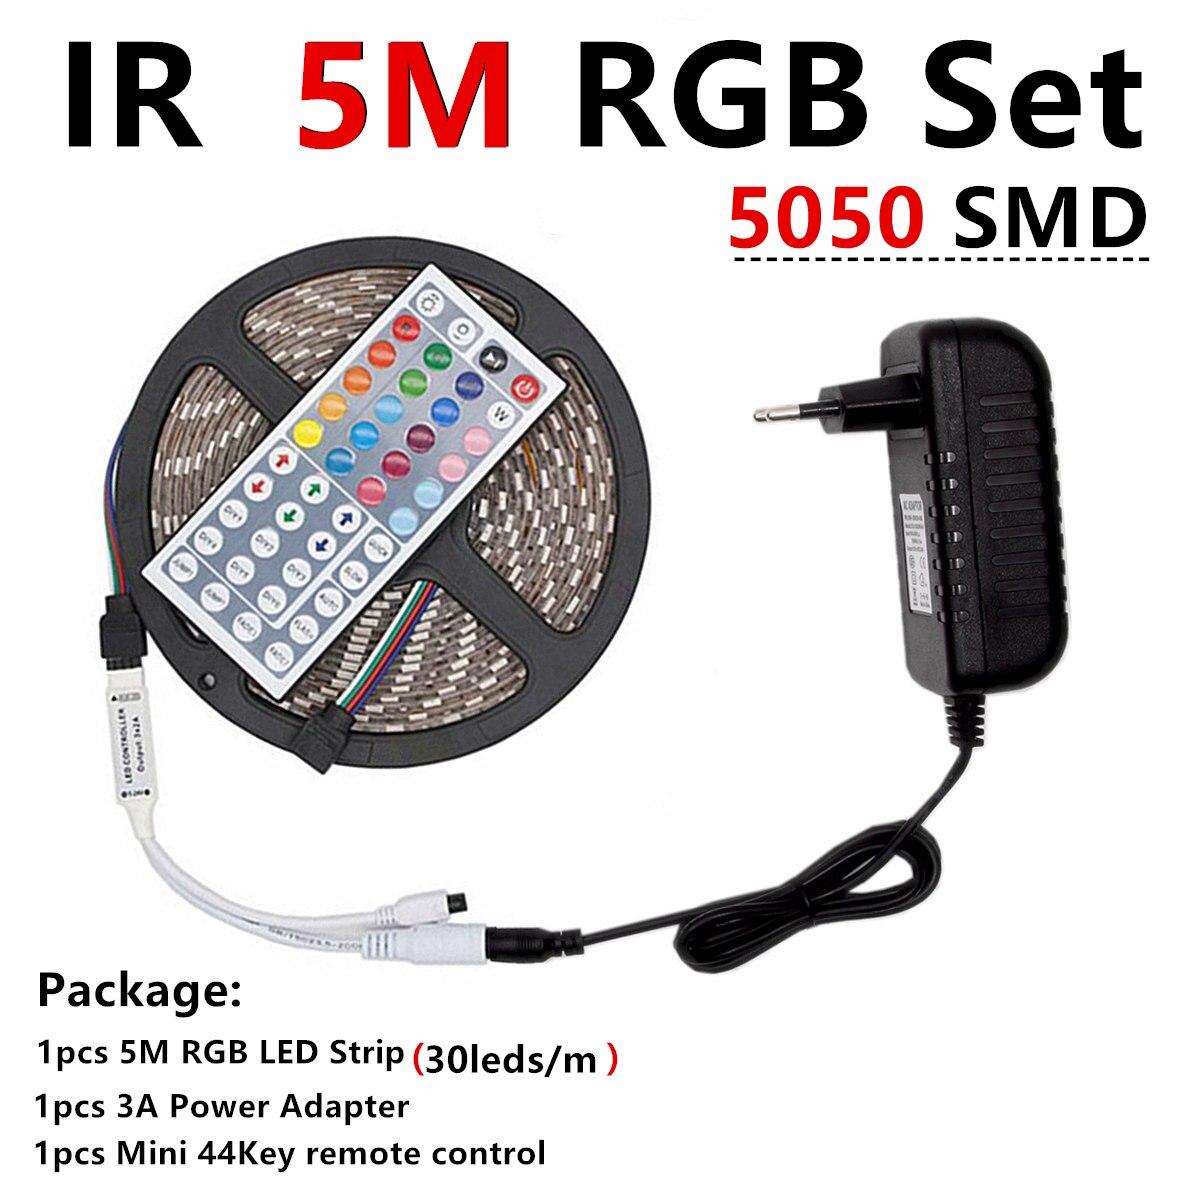 He4fa4db2c0d84b668bb4a77948613bf1T RGB LED Strip Light RGB 5050 SMD 2835 Flexible Ribbon fita led light strip RGB 5M 10M Tape Diode DC 12V Remote Control Adapter